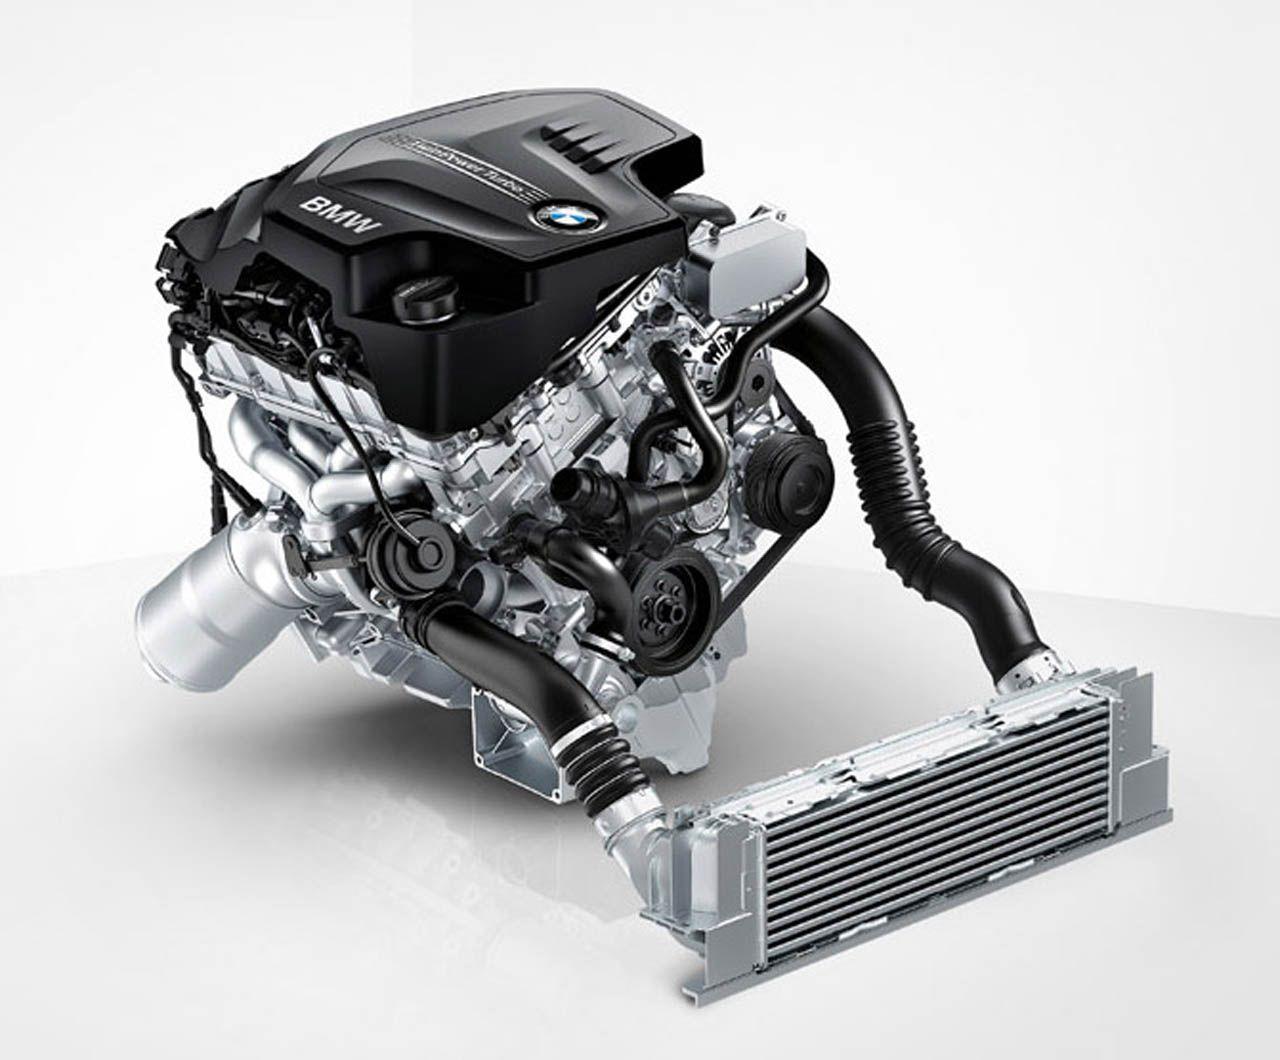 bmw n55 engine - Google 検索